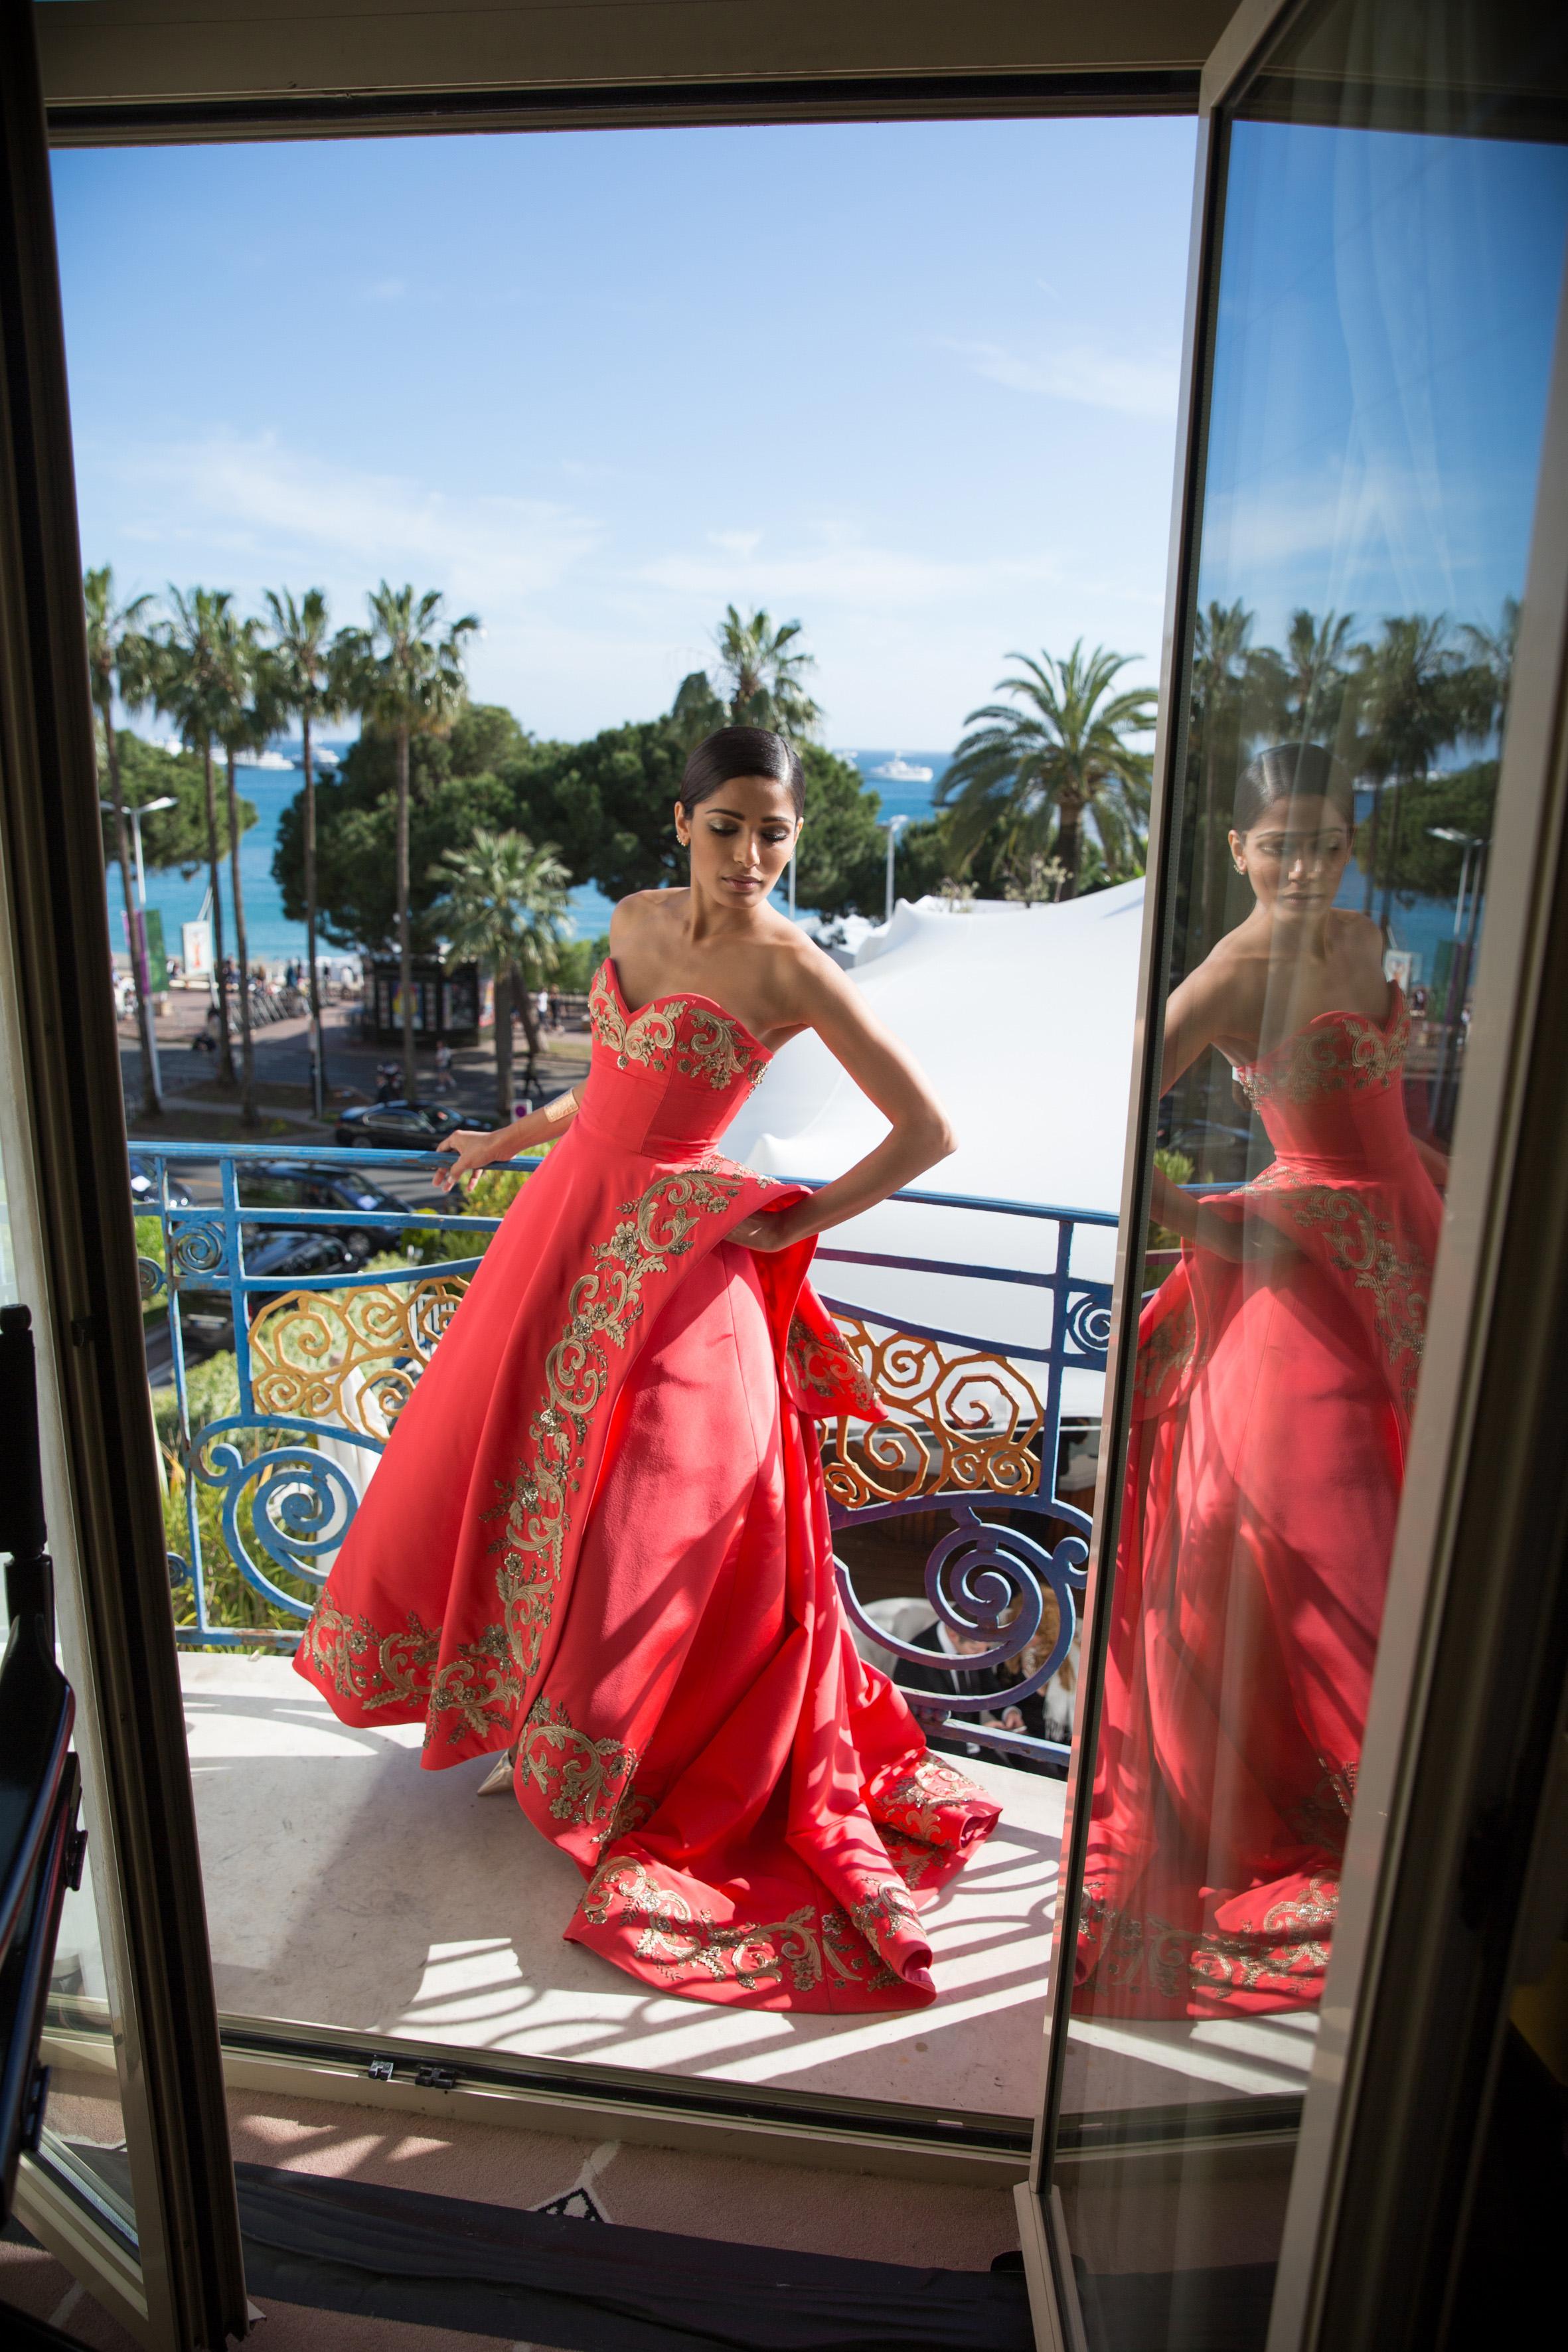 Inside Cannes Pics - Freida Pinto 18-05-14  - 3_picture_original